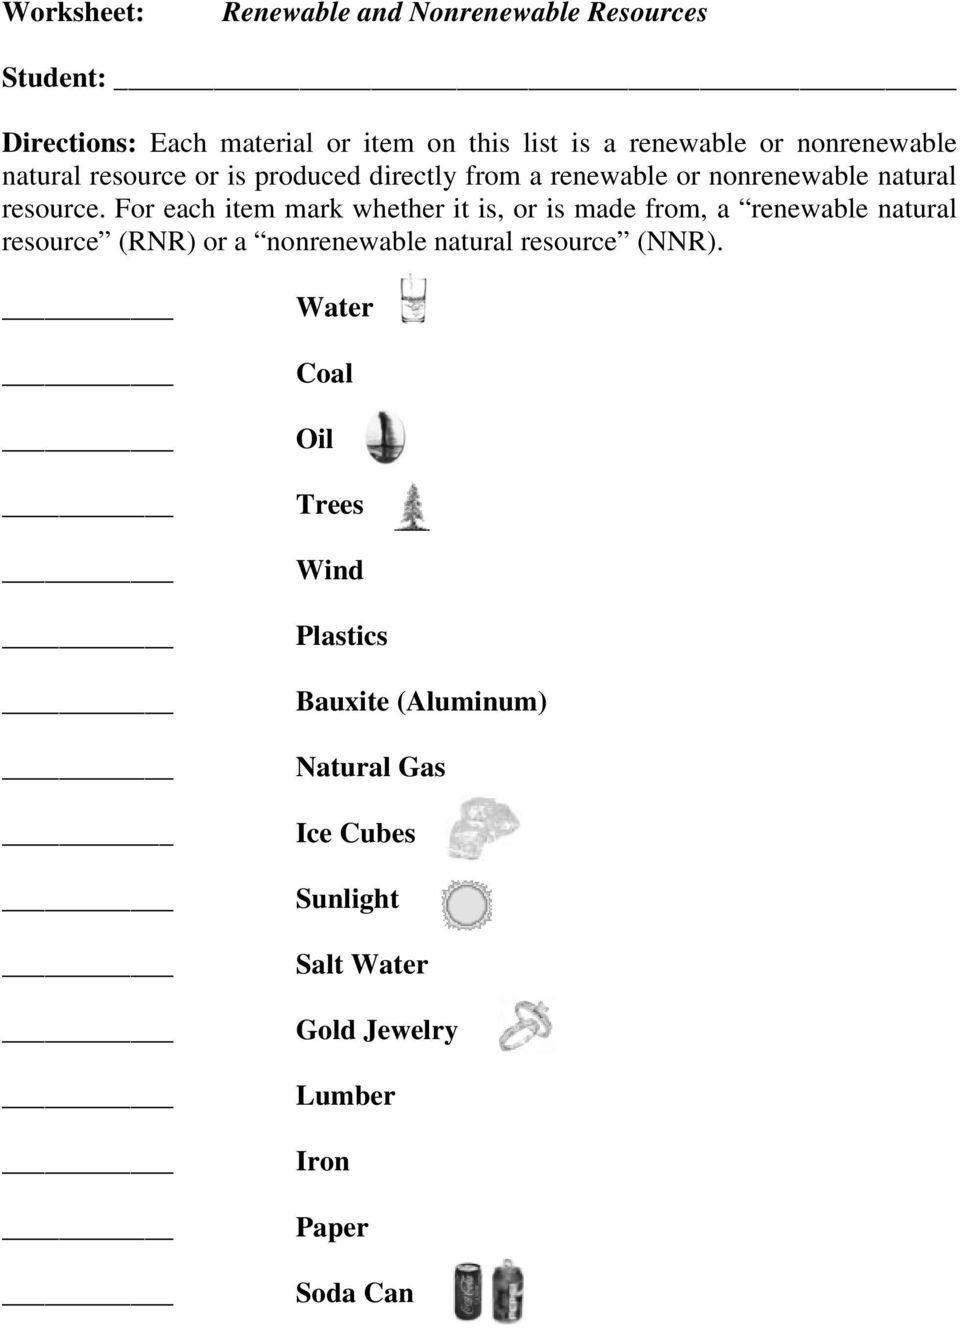 Renewable Vs Nonrenewable Resources Worksheet Renewable And Nonrenewable In 2020 Nonrenewable Resources Third Grade Science Worksheets Kindergarten Addition Worksheets